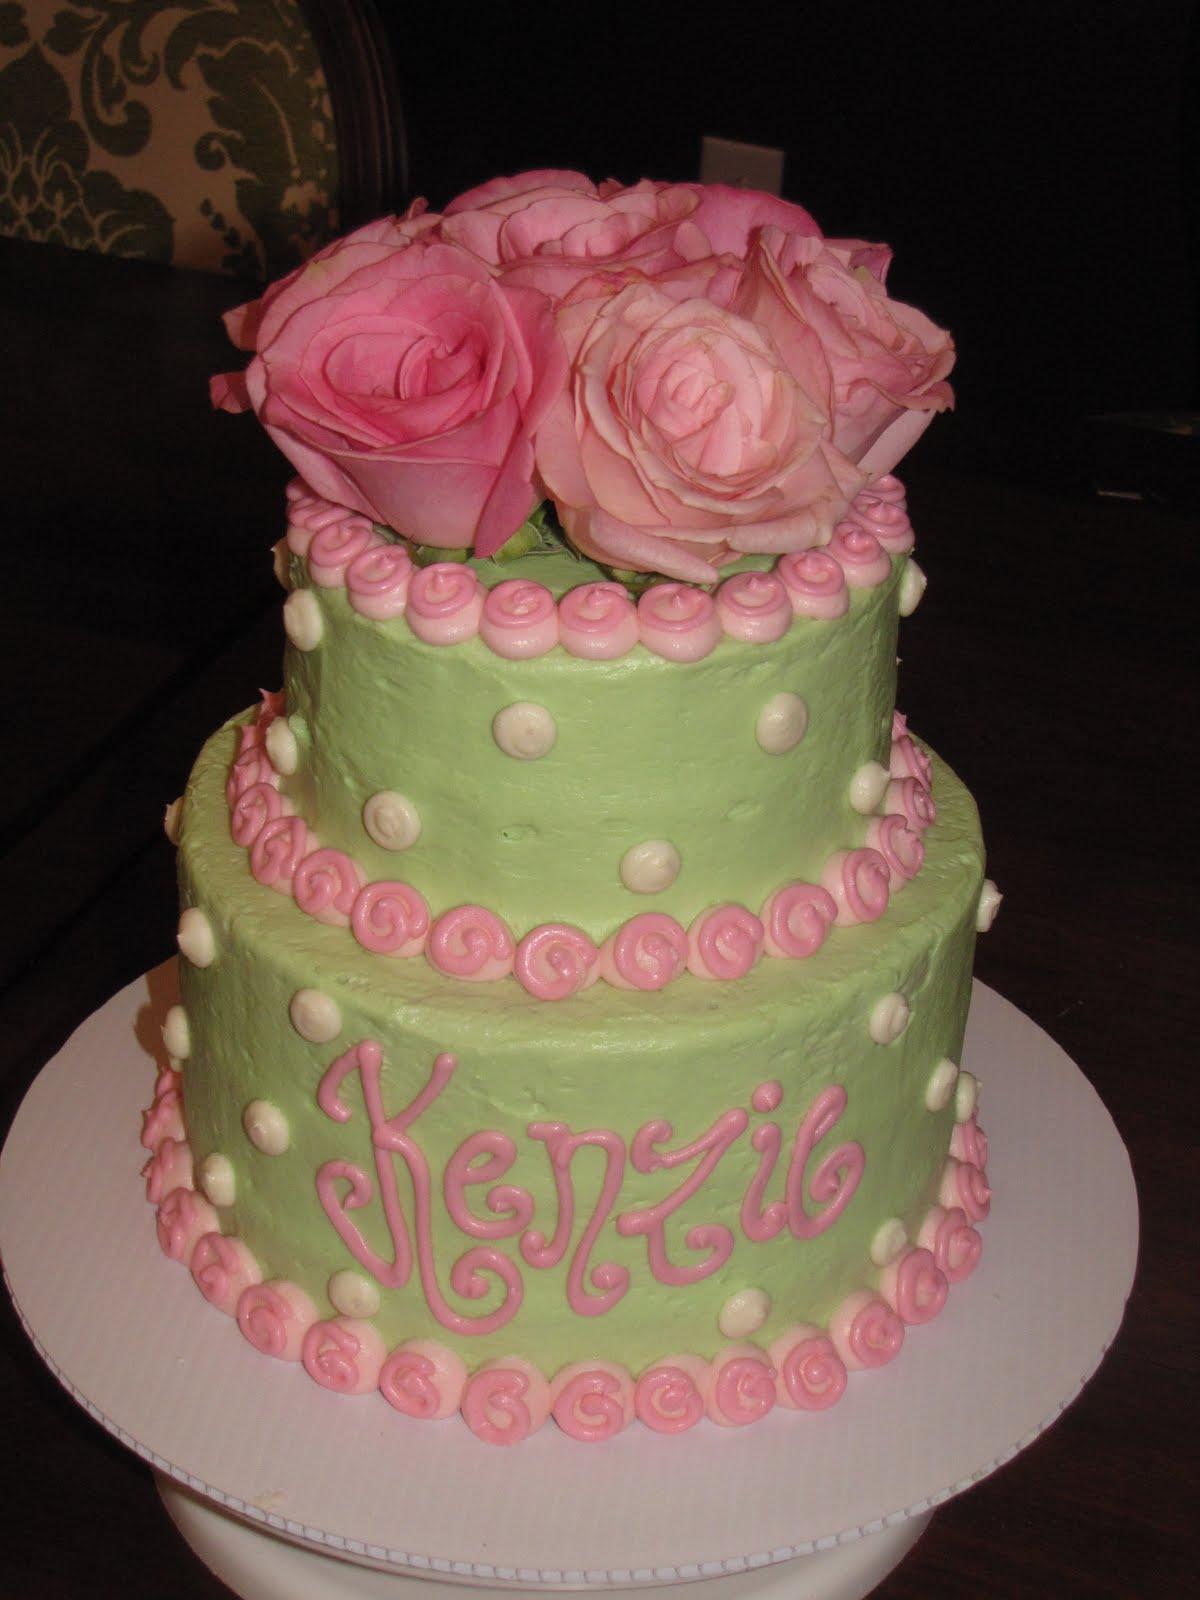 Simply Charming Cakes Shabby Chic Birthday Cake